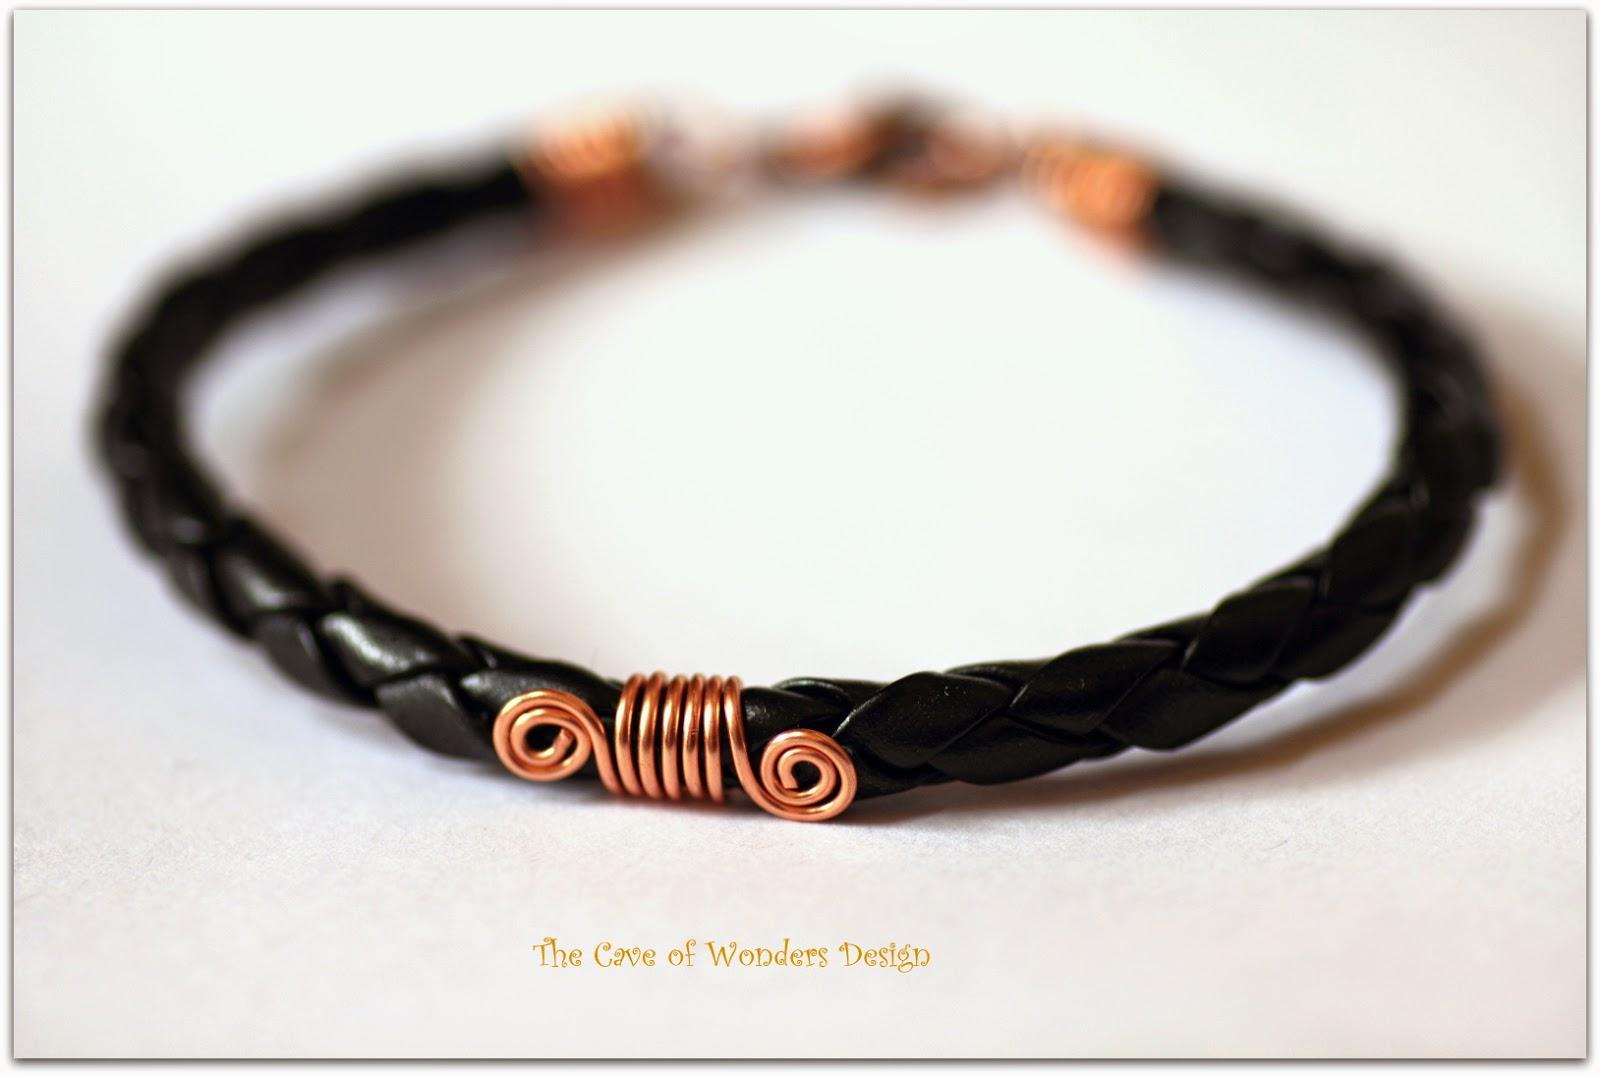 http://it.dawanda.com/product/45177050-Armband-Maenner-Kunstleder-und-Kupfer